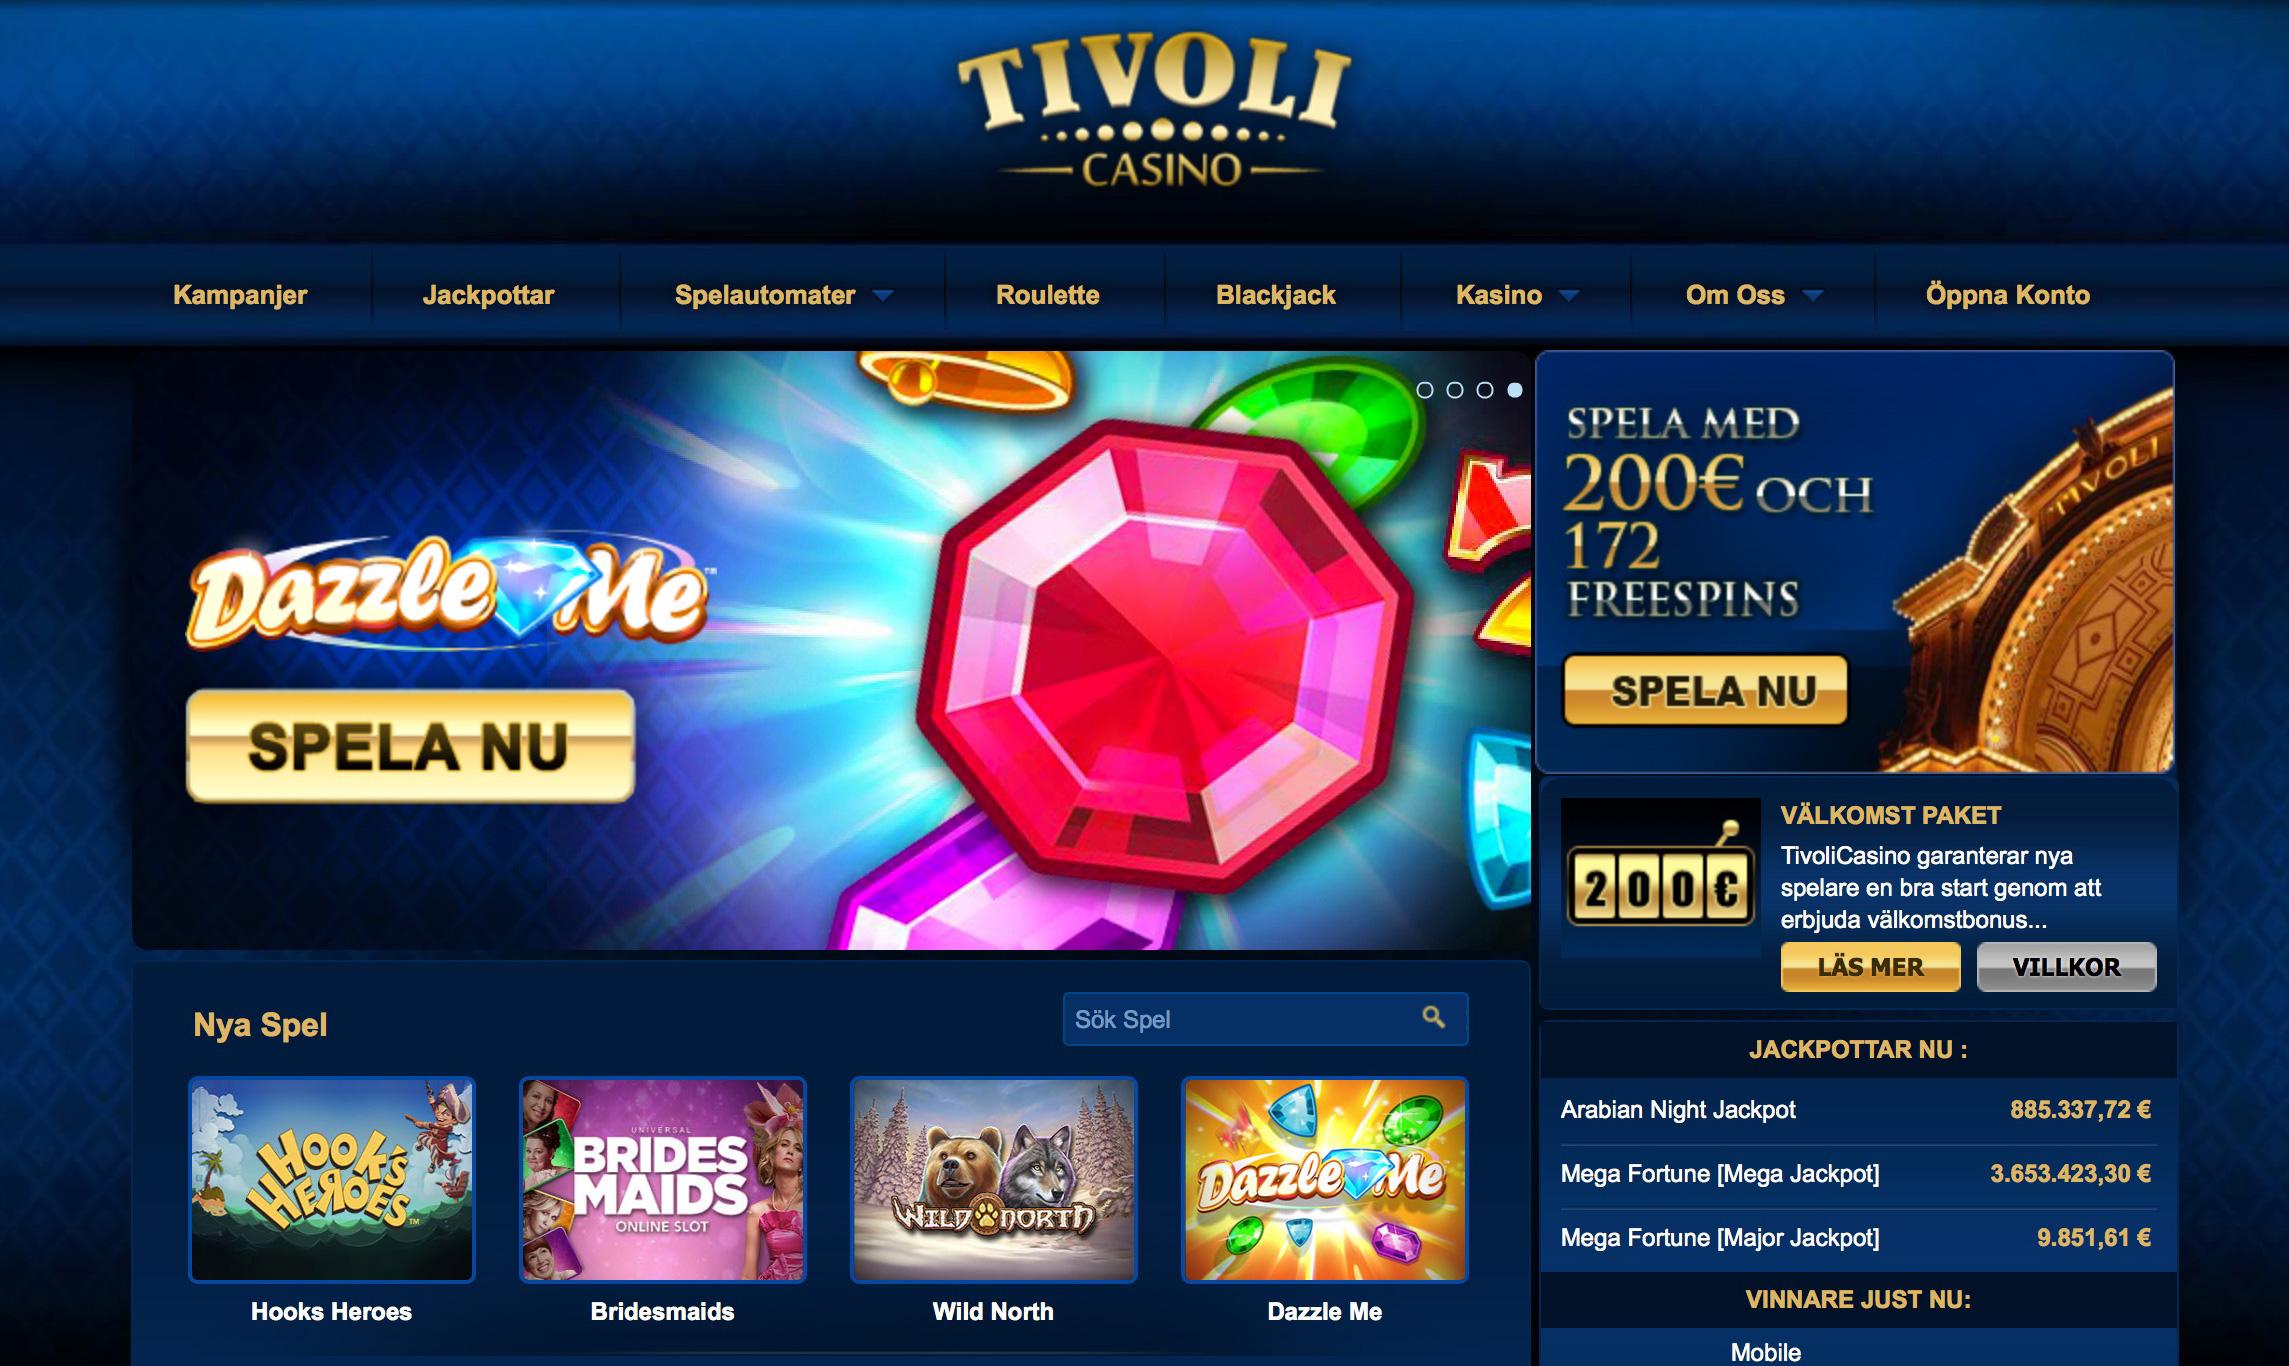 Tivoli Casino - 1000 kr + 72 free spins i bonus!